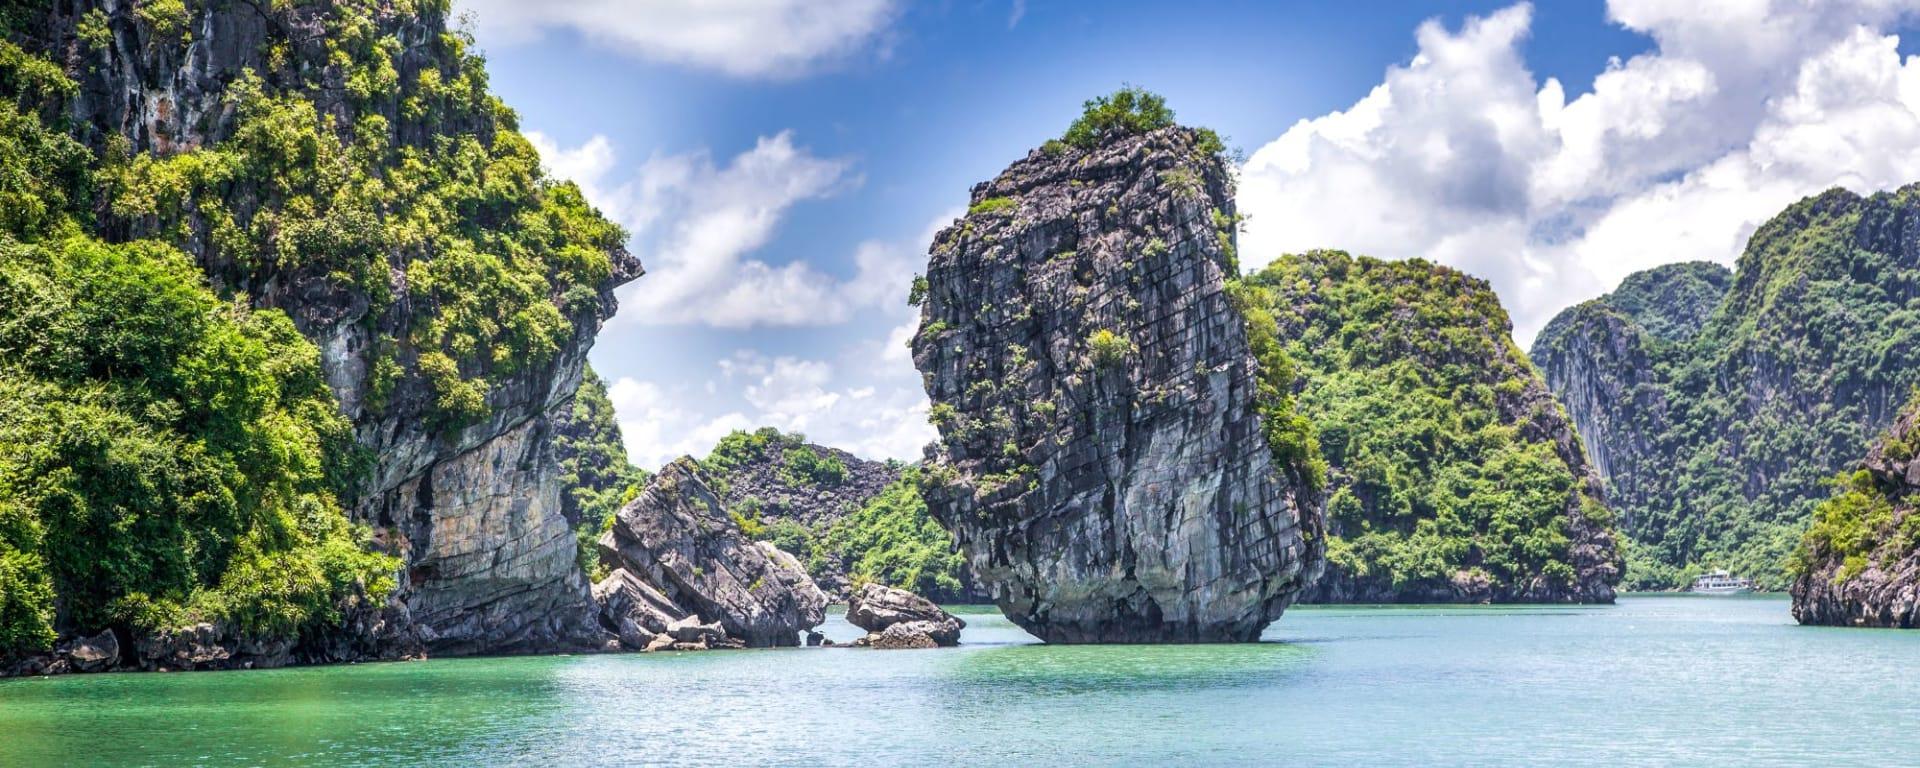 Grosse Indochina Reise ab Luang Prabang: Halong Bay cruising among beautiful limestone rocks and secluded beaches